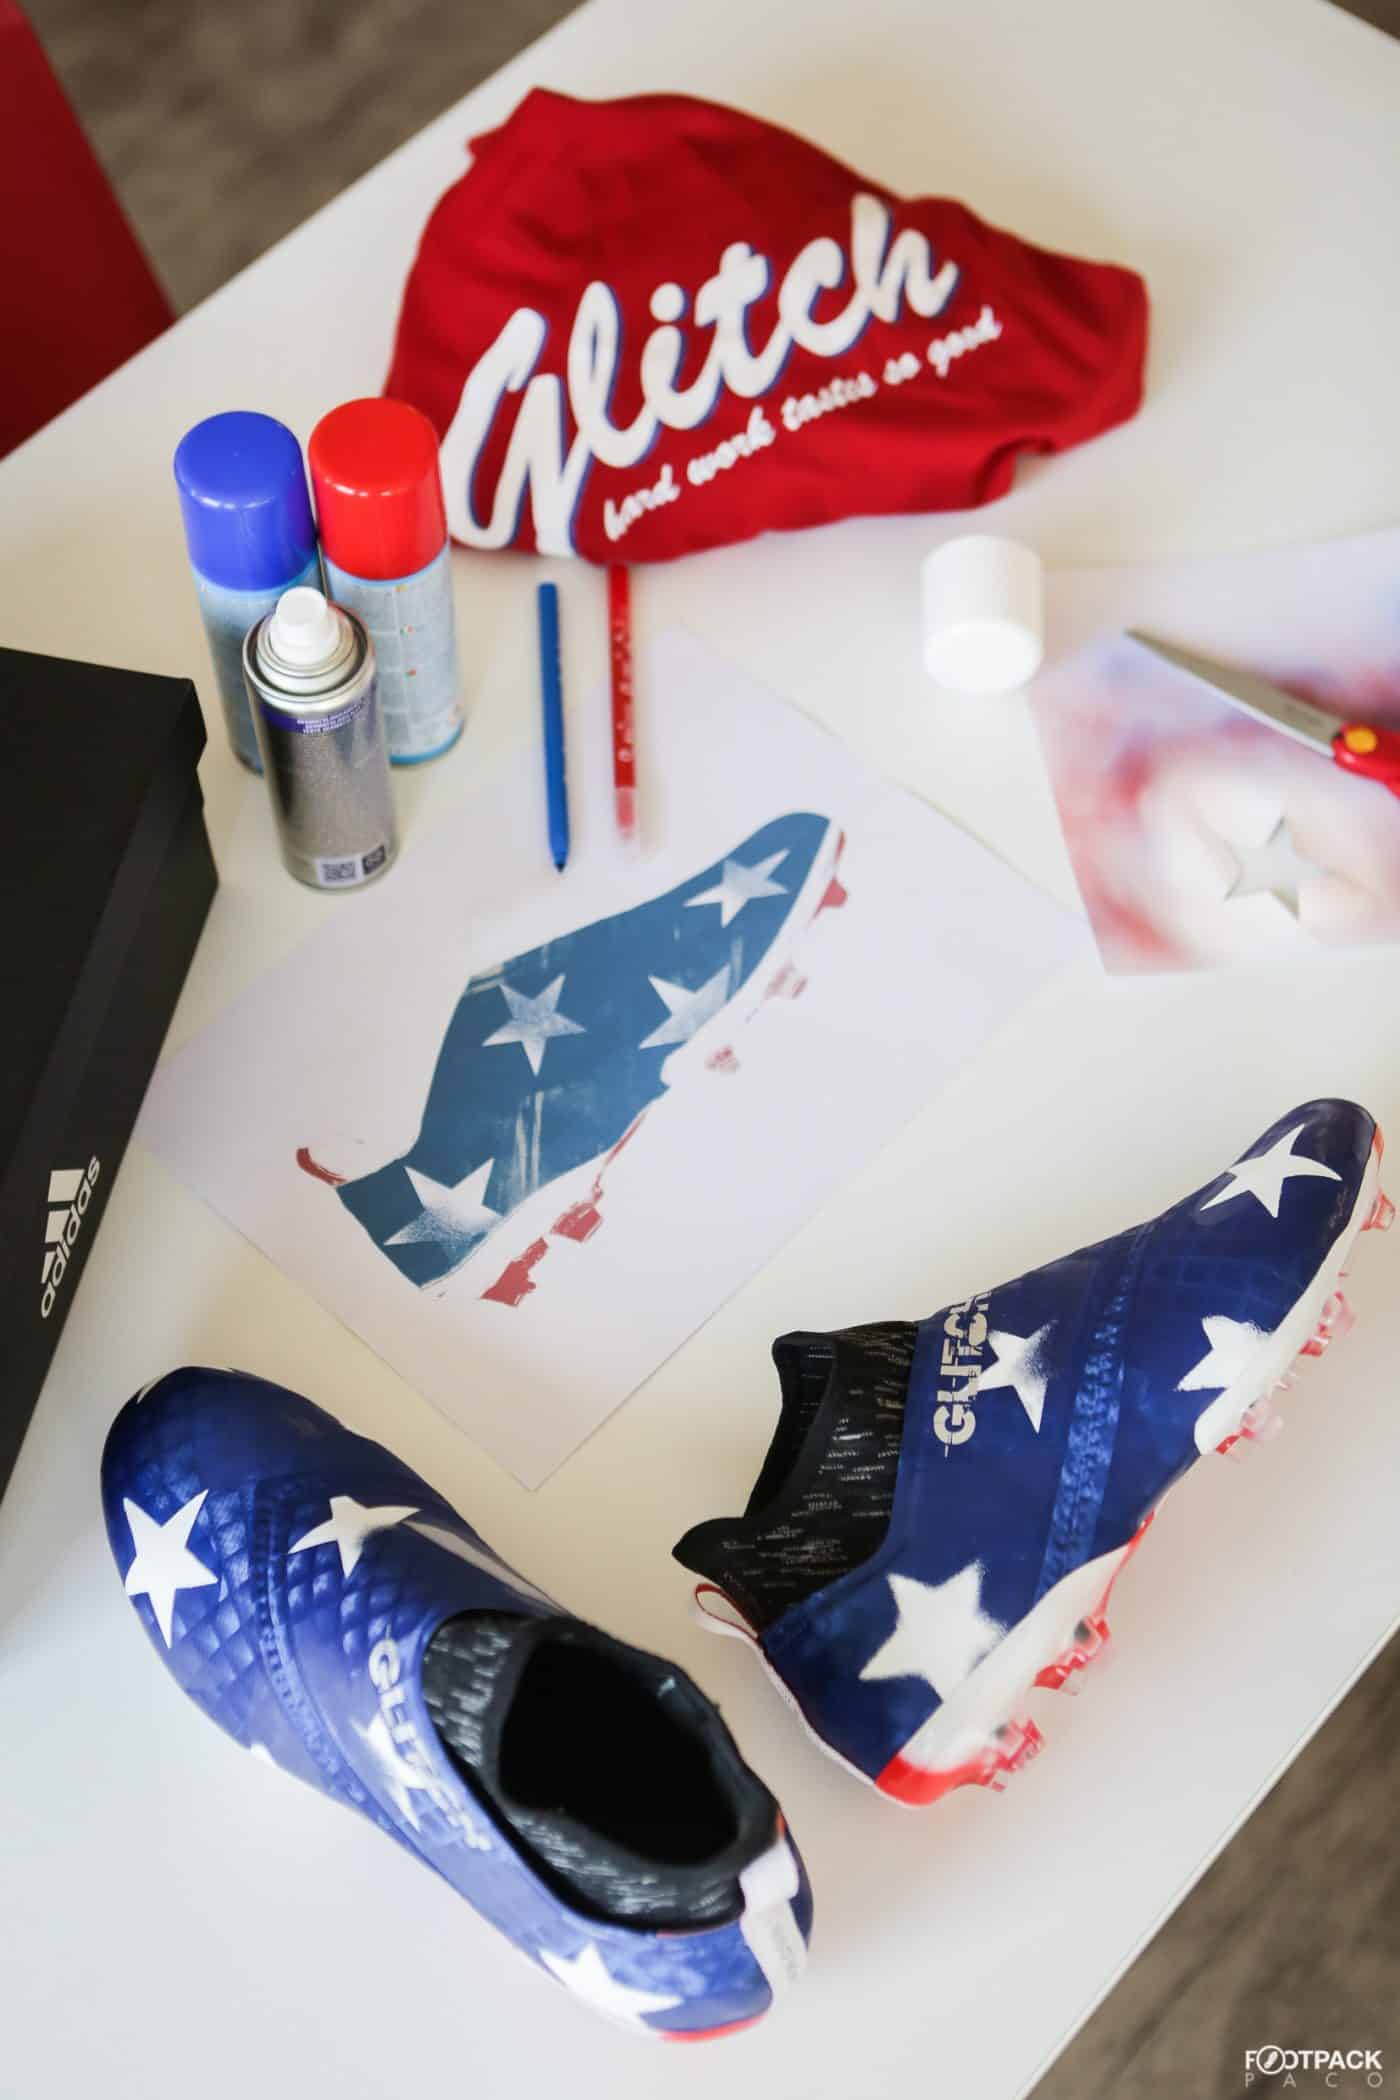 adidas-glitch-skin-worldskin-equipe-de-france-etoiles-7